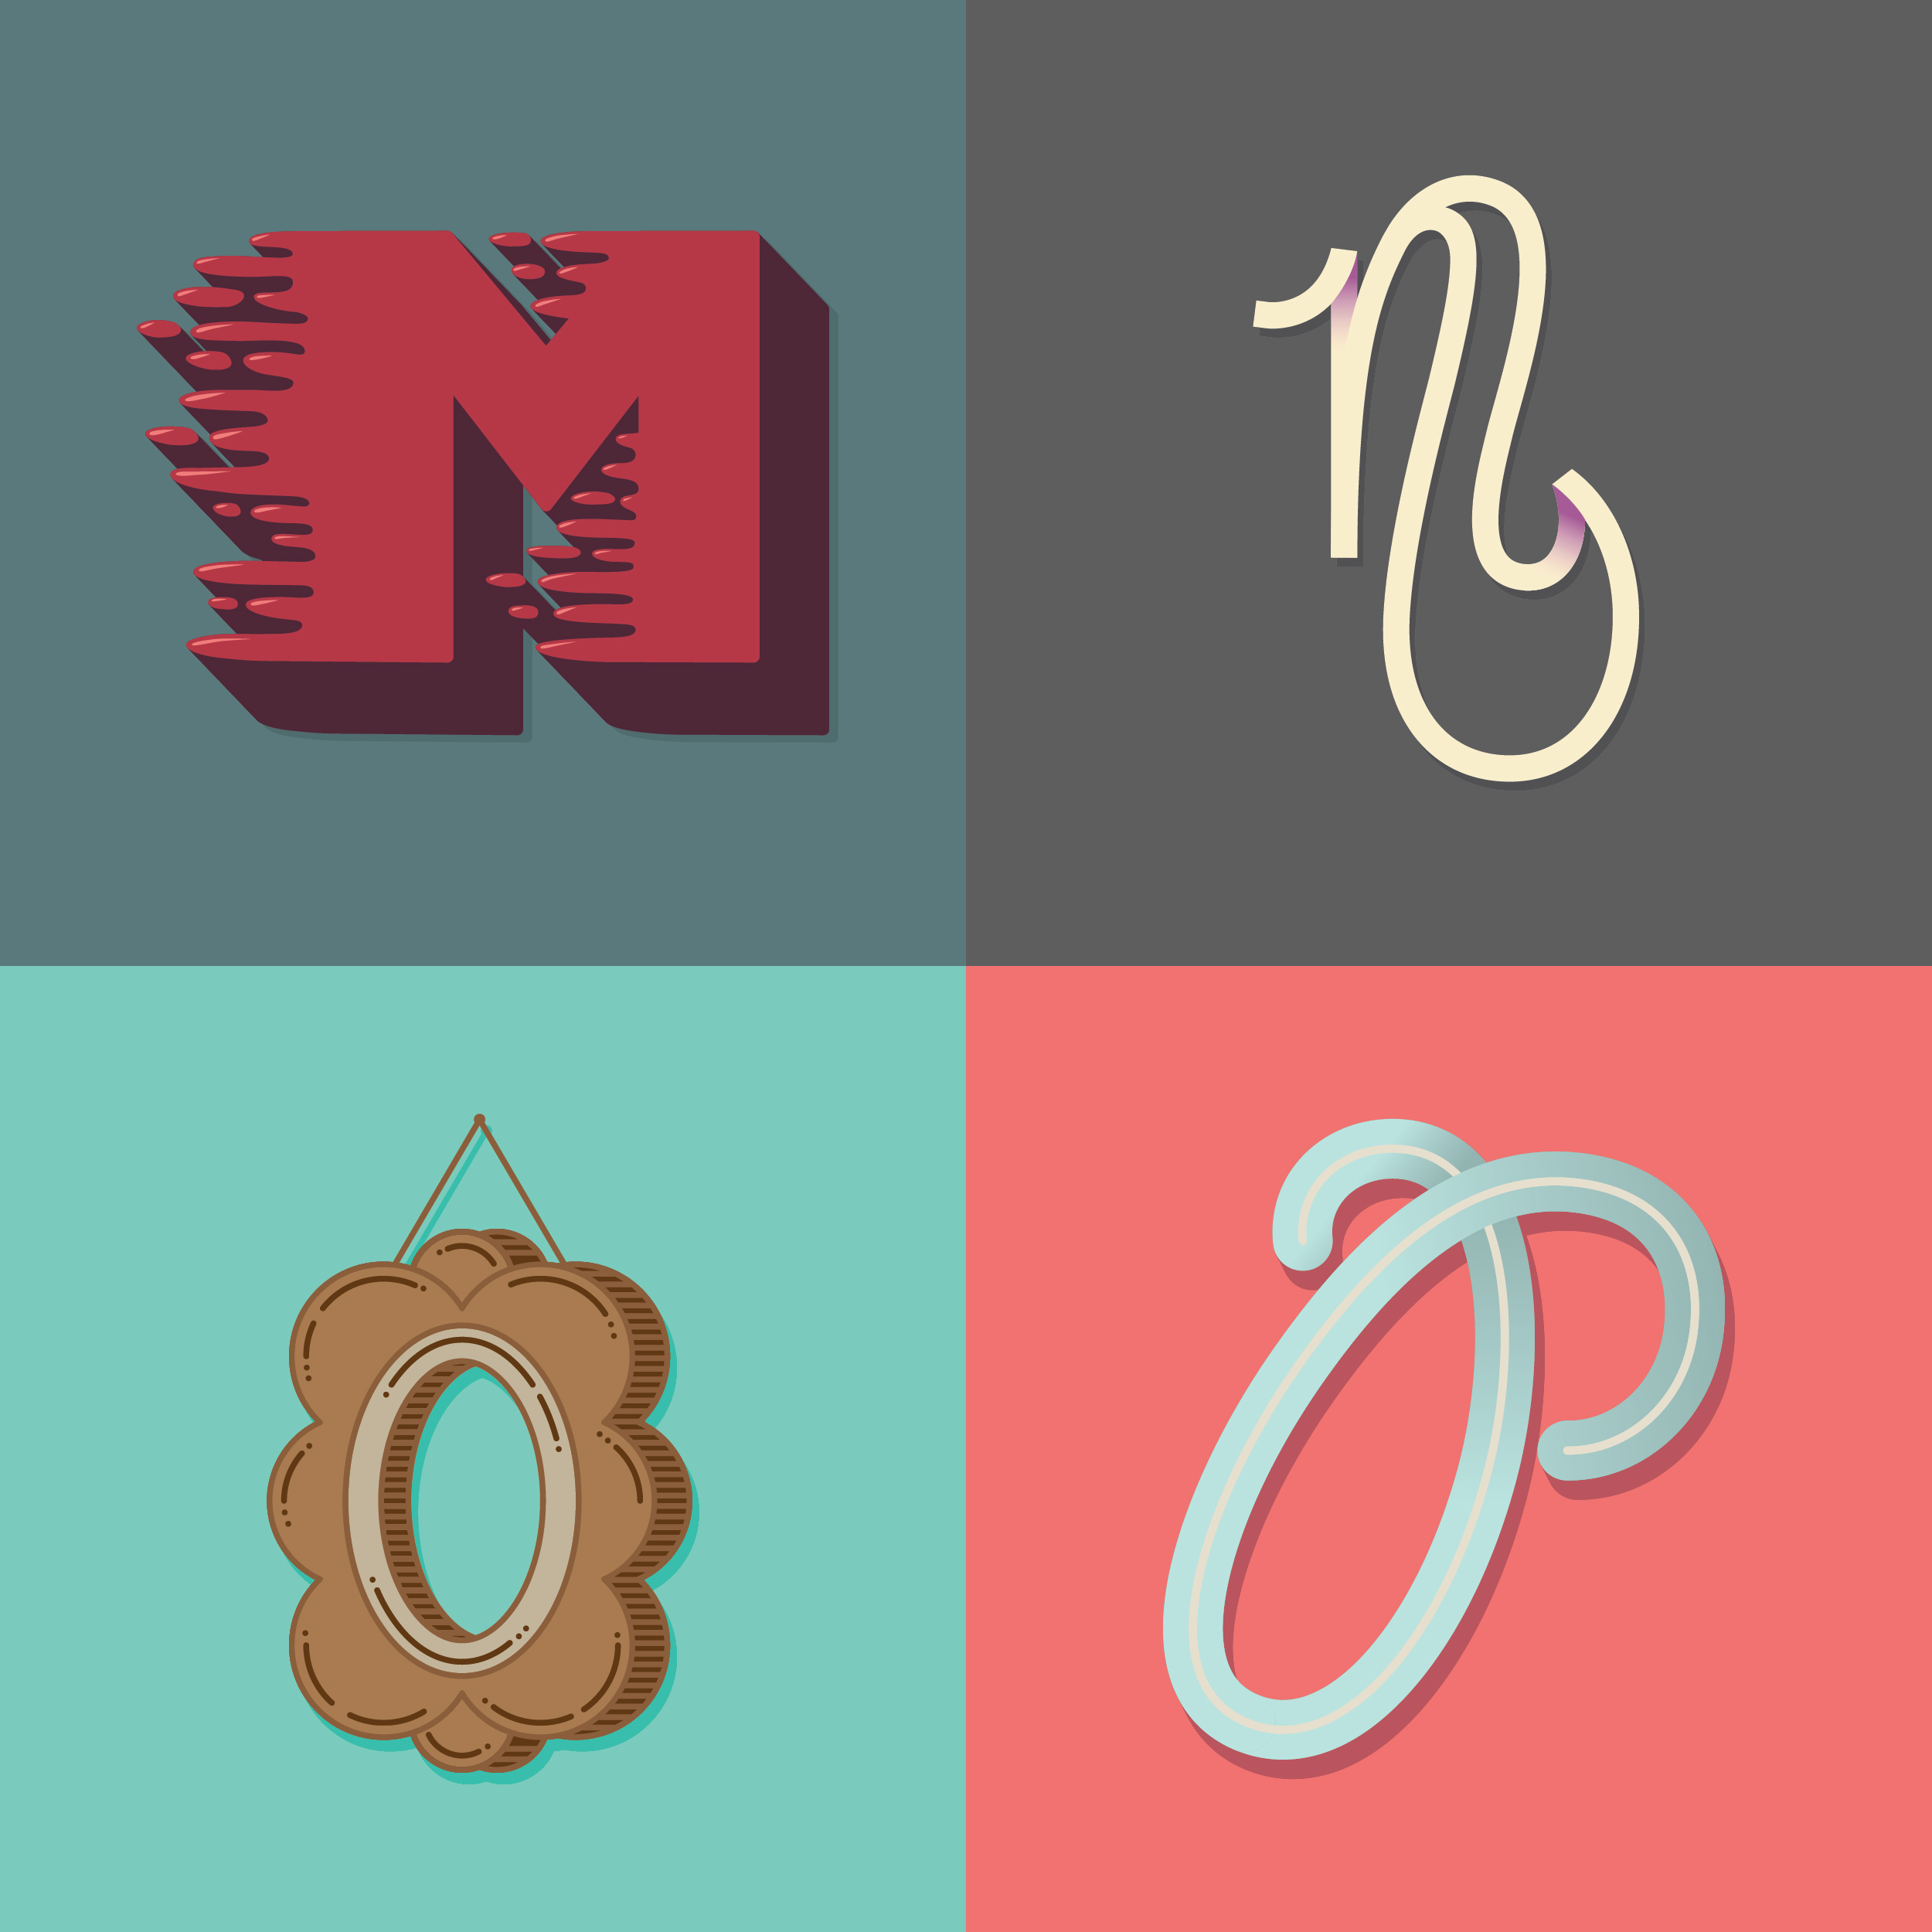 m-p-01.jpg